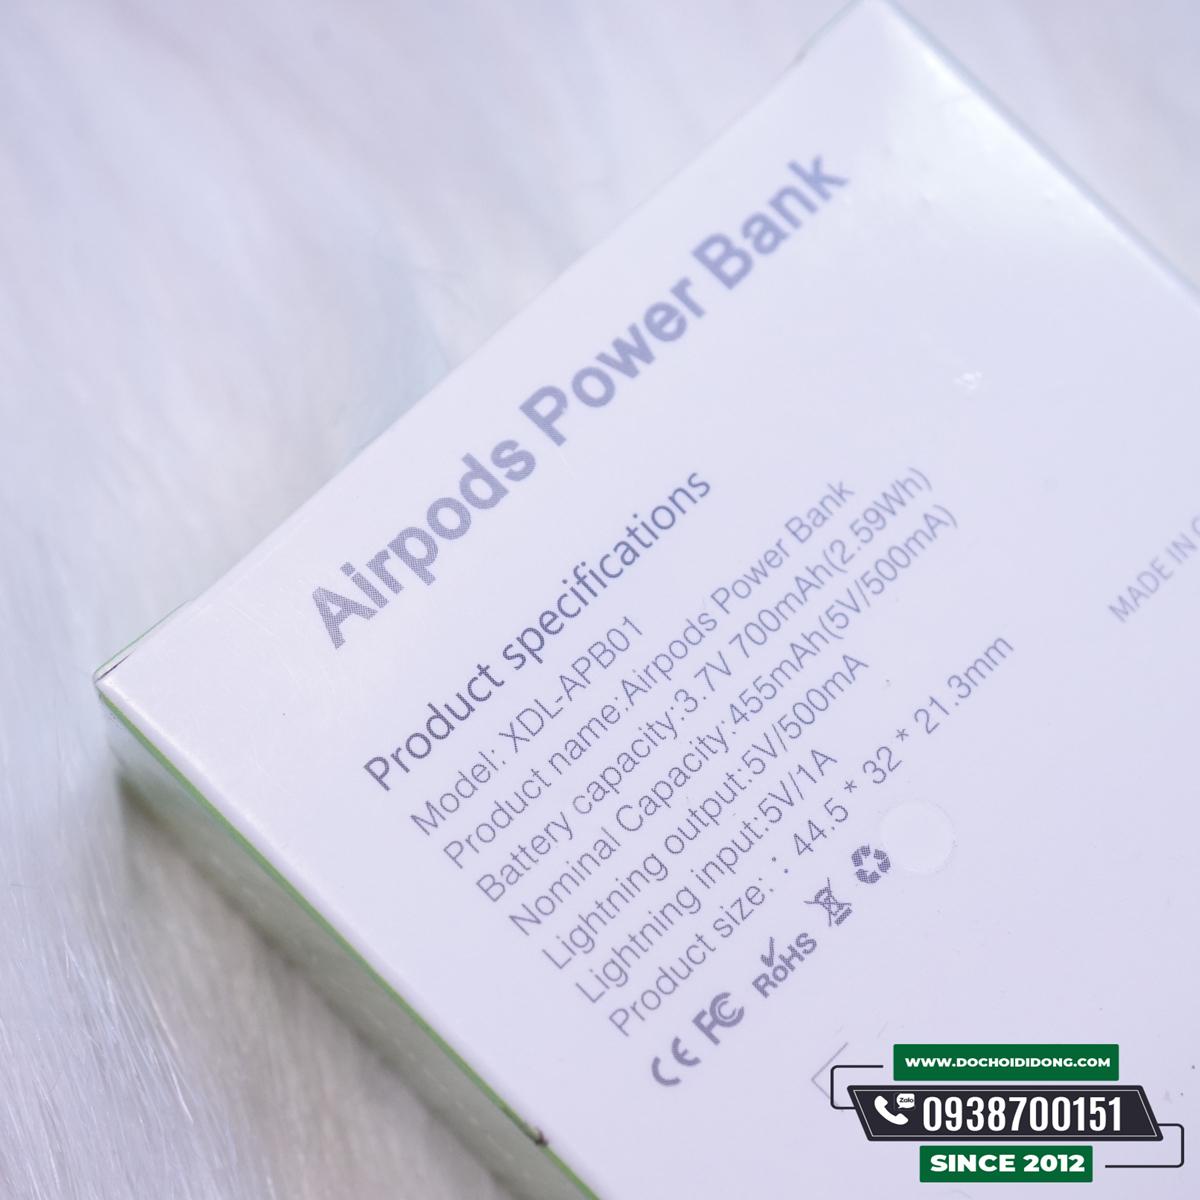 sac-du-phong-di-dong-cho-airpods-1-2-pro-va-iphone